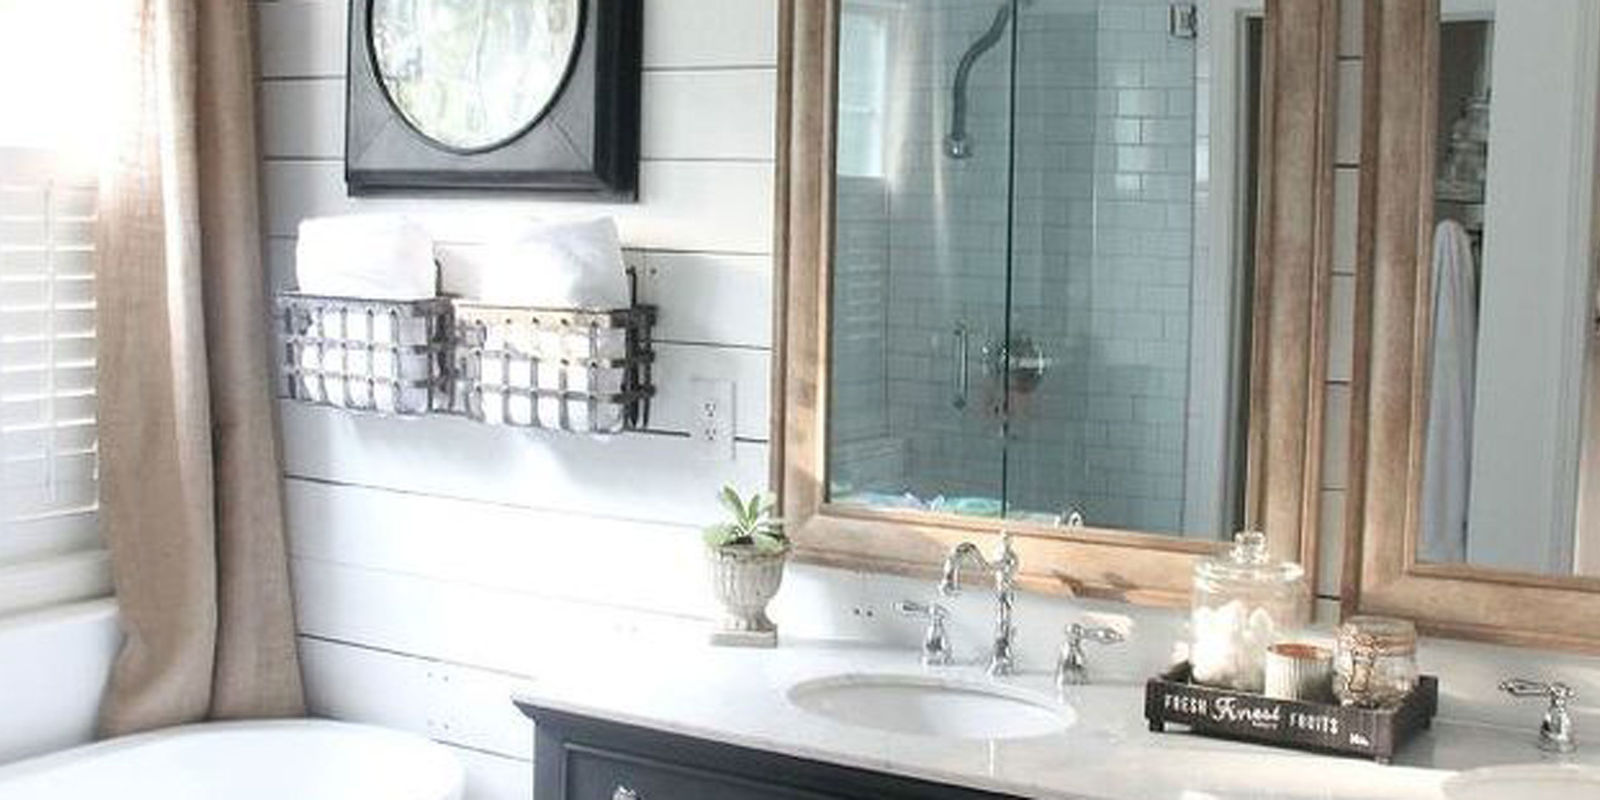 Farmhouse Bathroom Makeover - Rustic Bathroom Remodel on Rustic Farmhouse Bathroom  id=71670